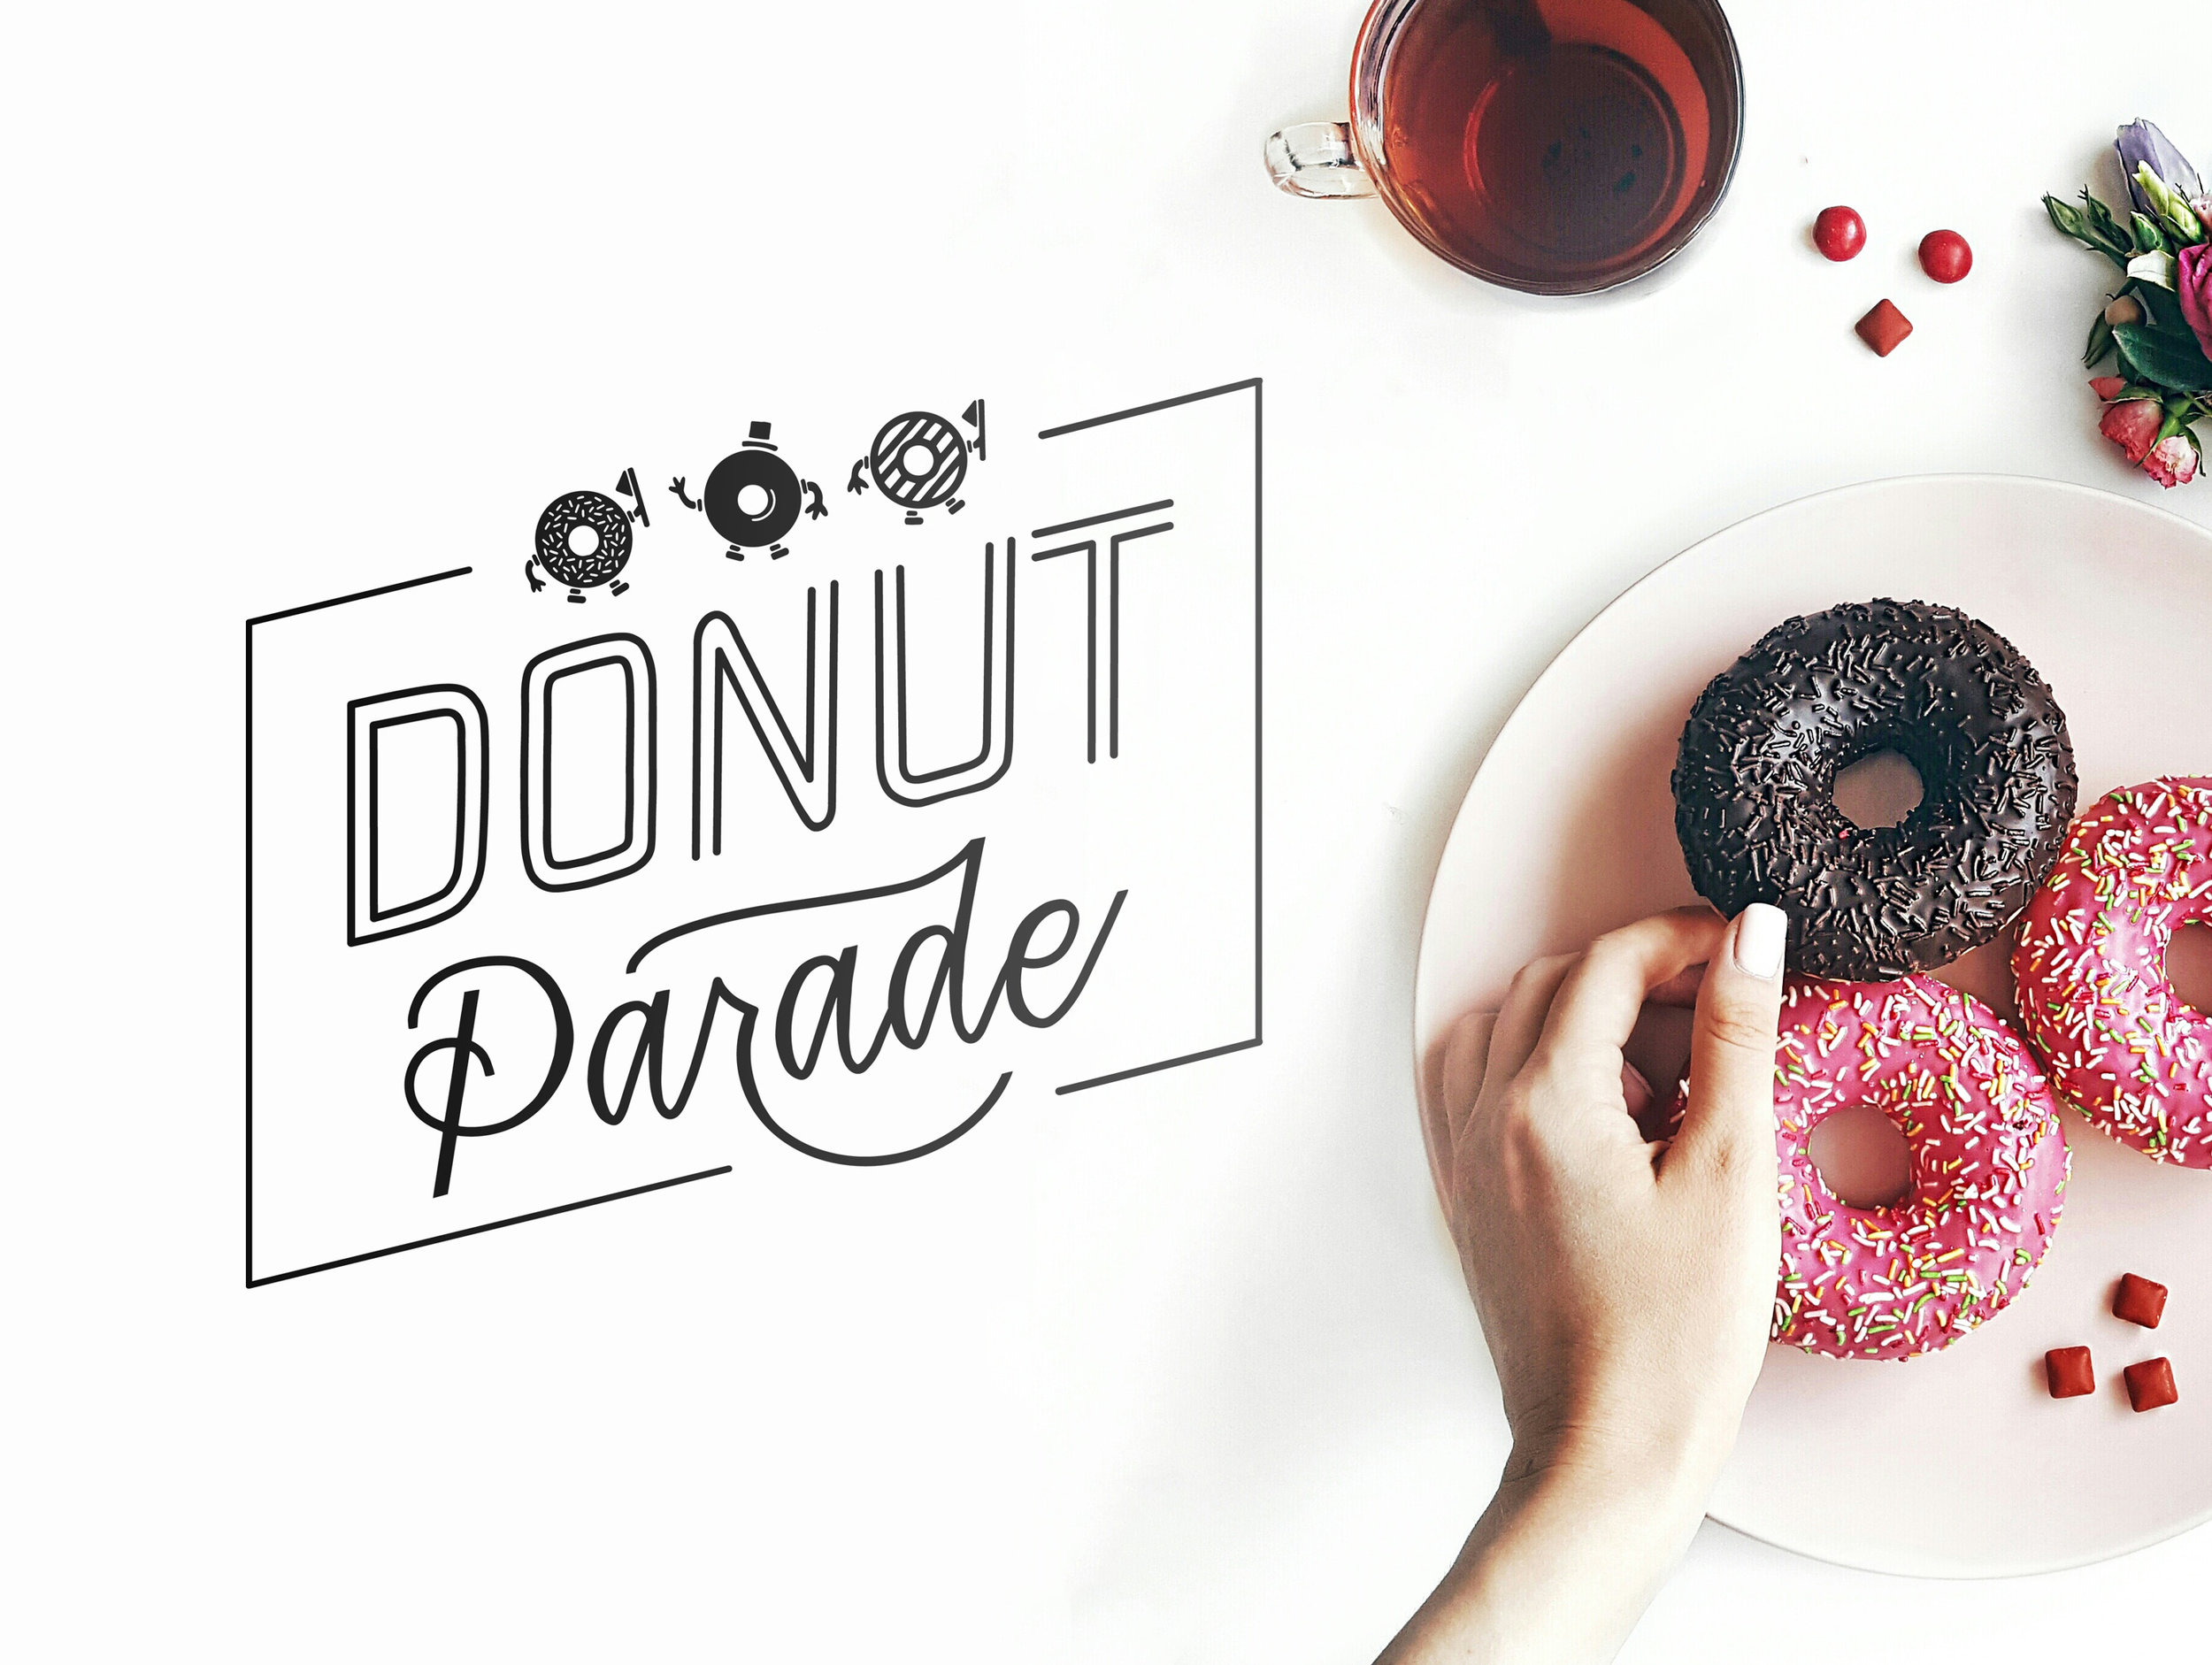 Donut-Parade-Mocup.jpg